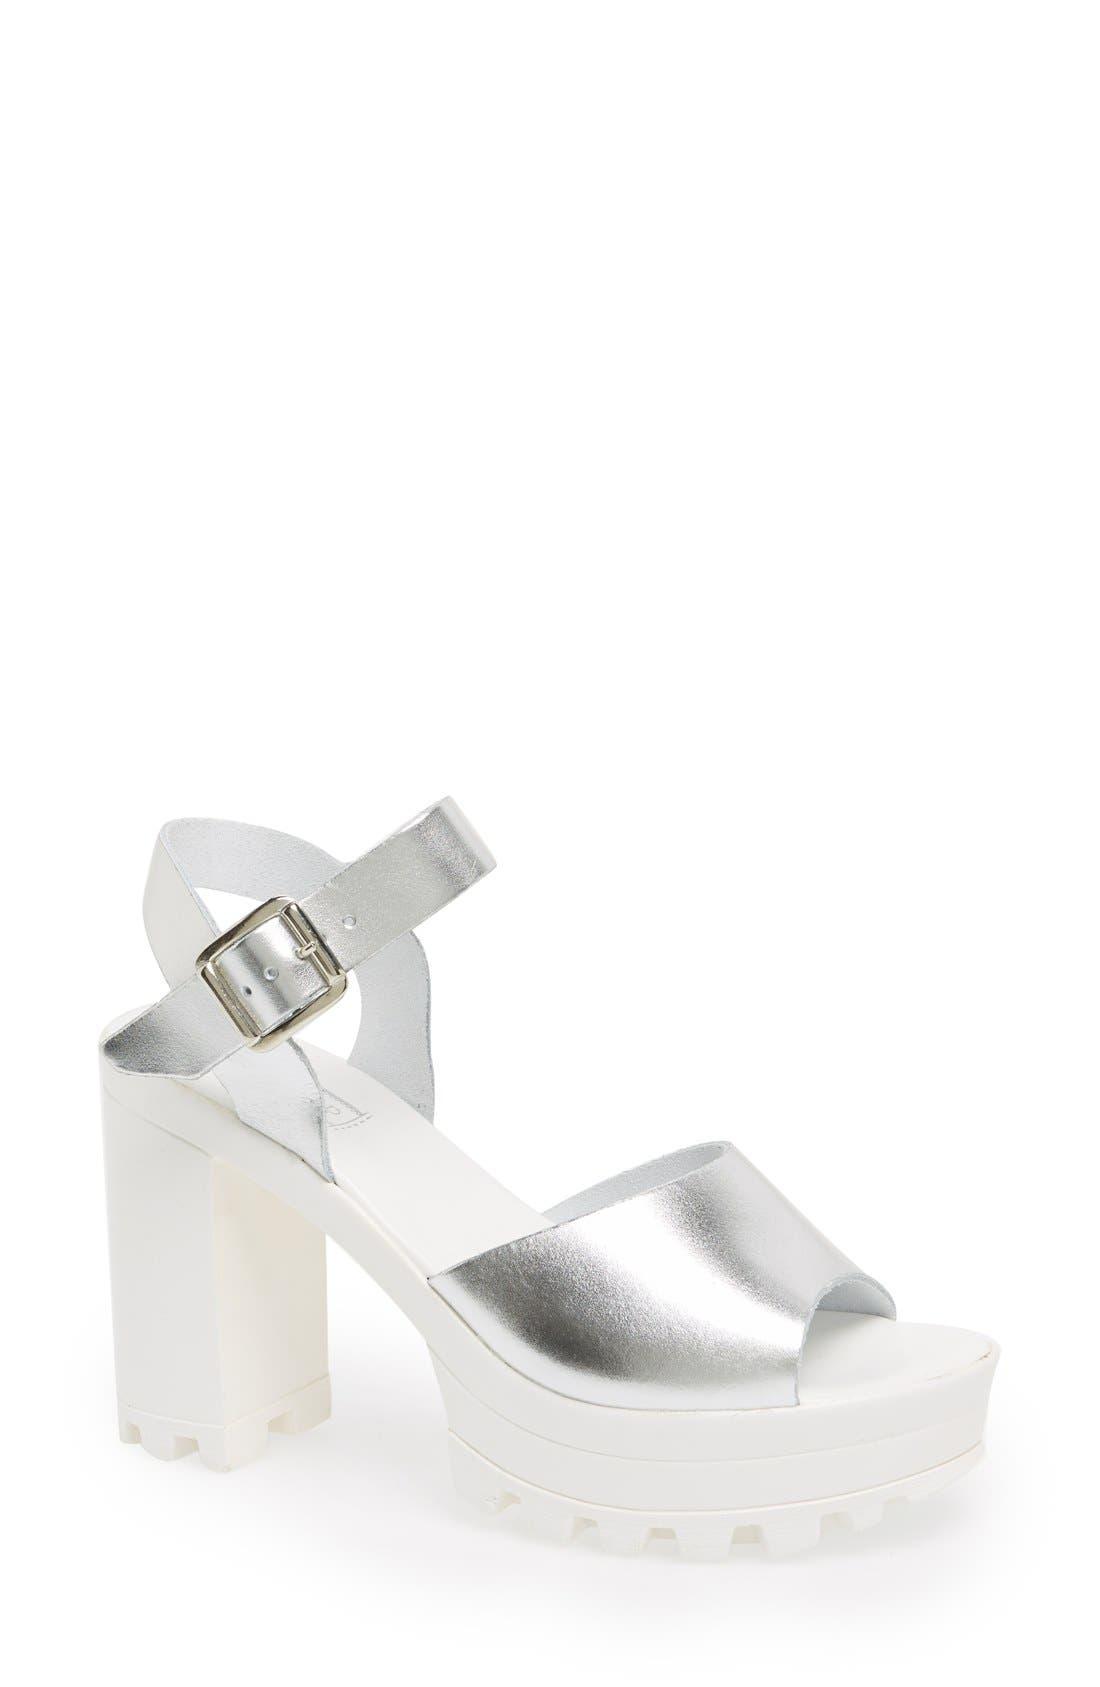 Main Image - Topshop 'Lena' Chunky Sole Platform Sandal (Women)